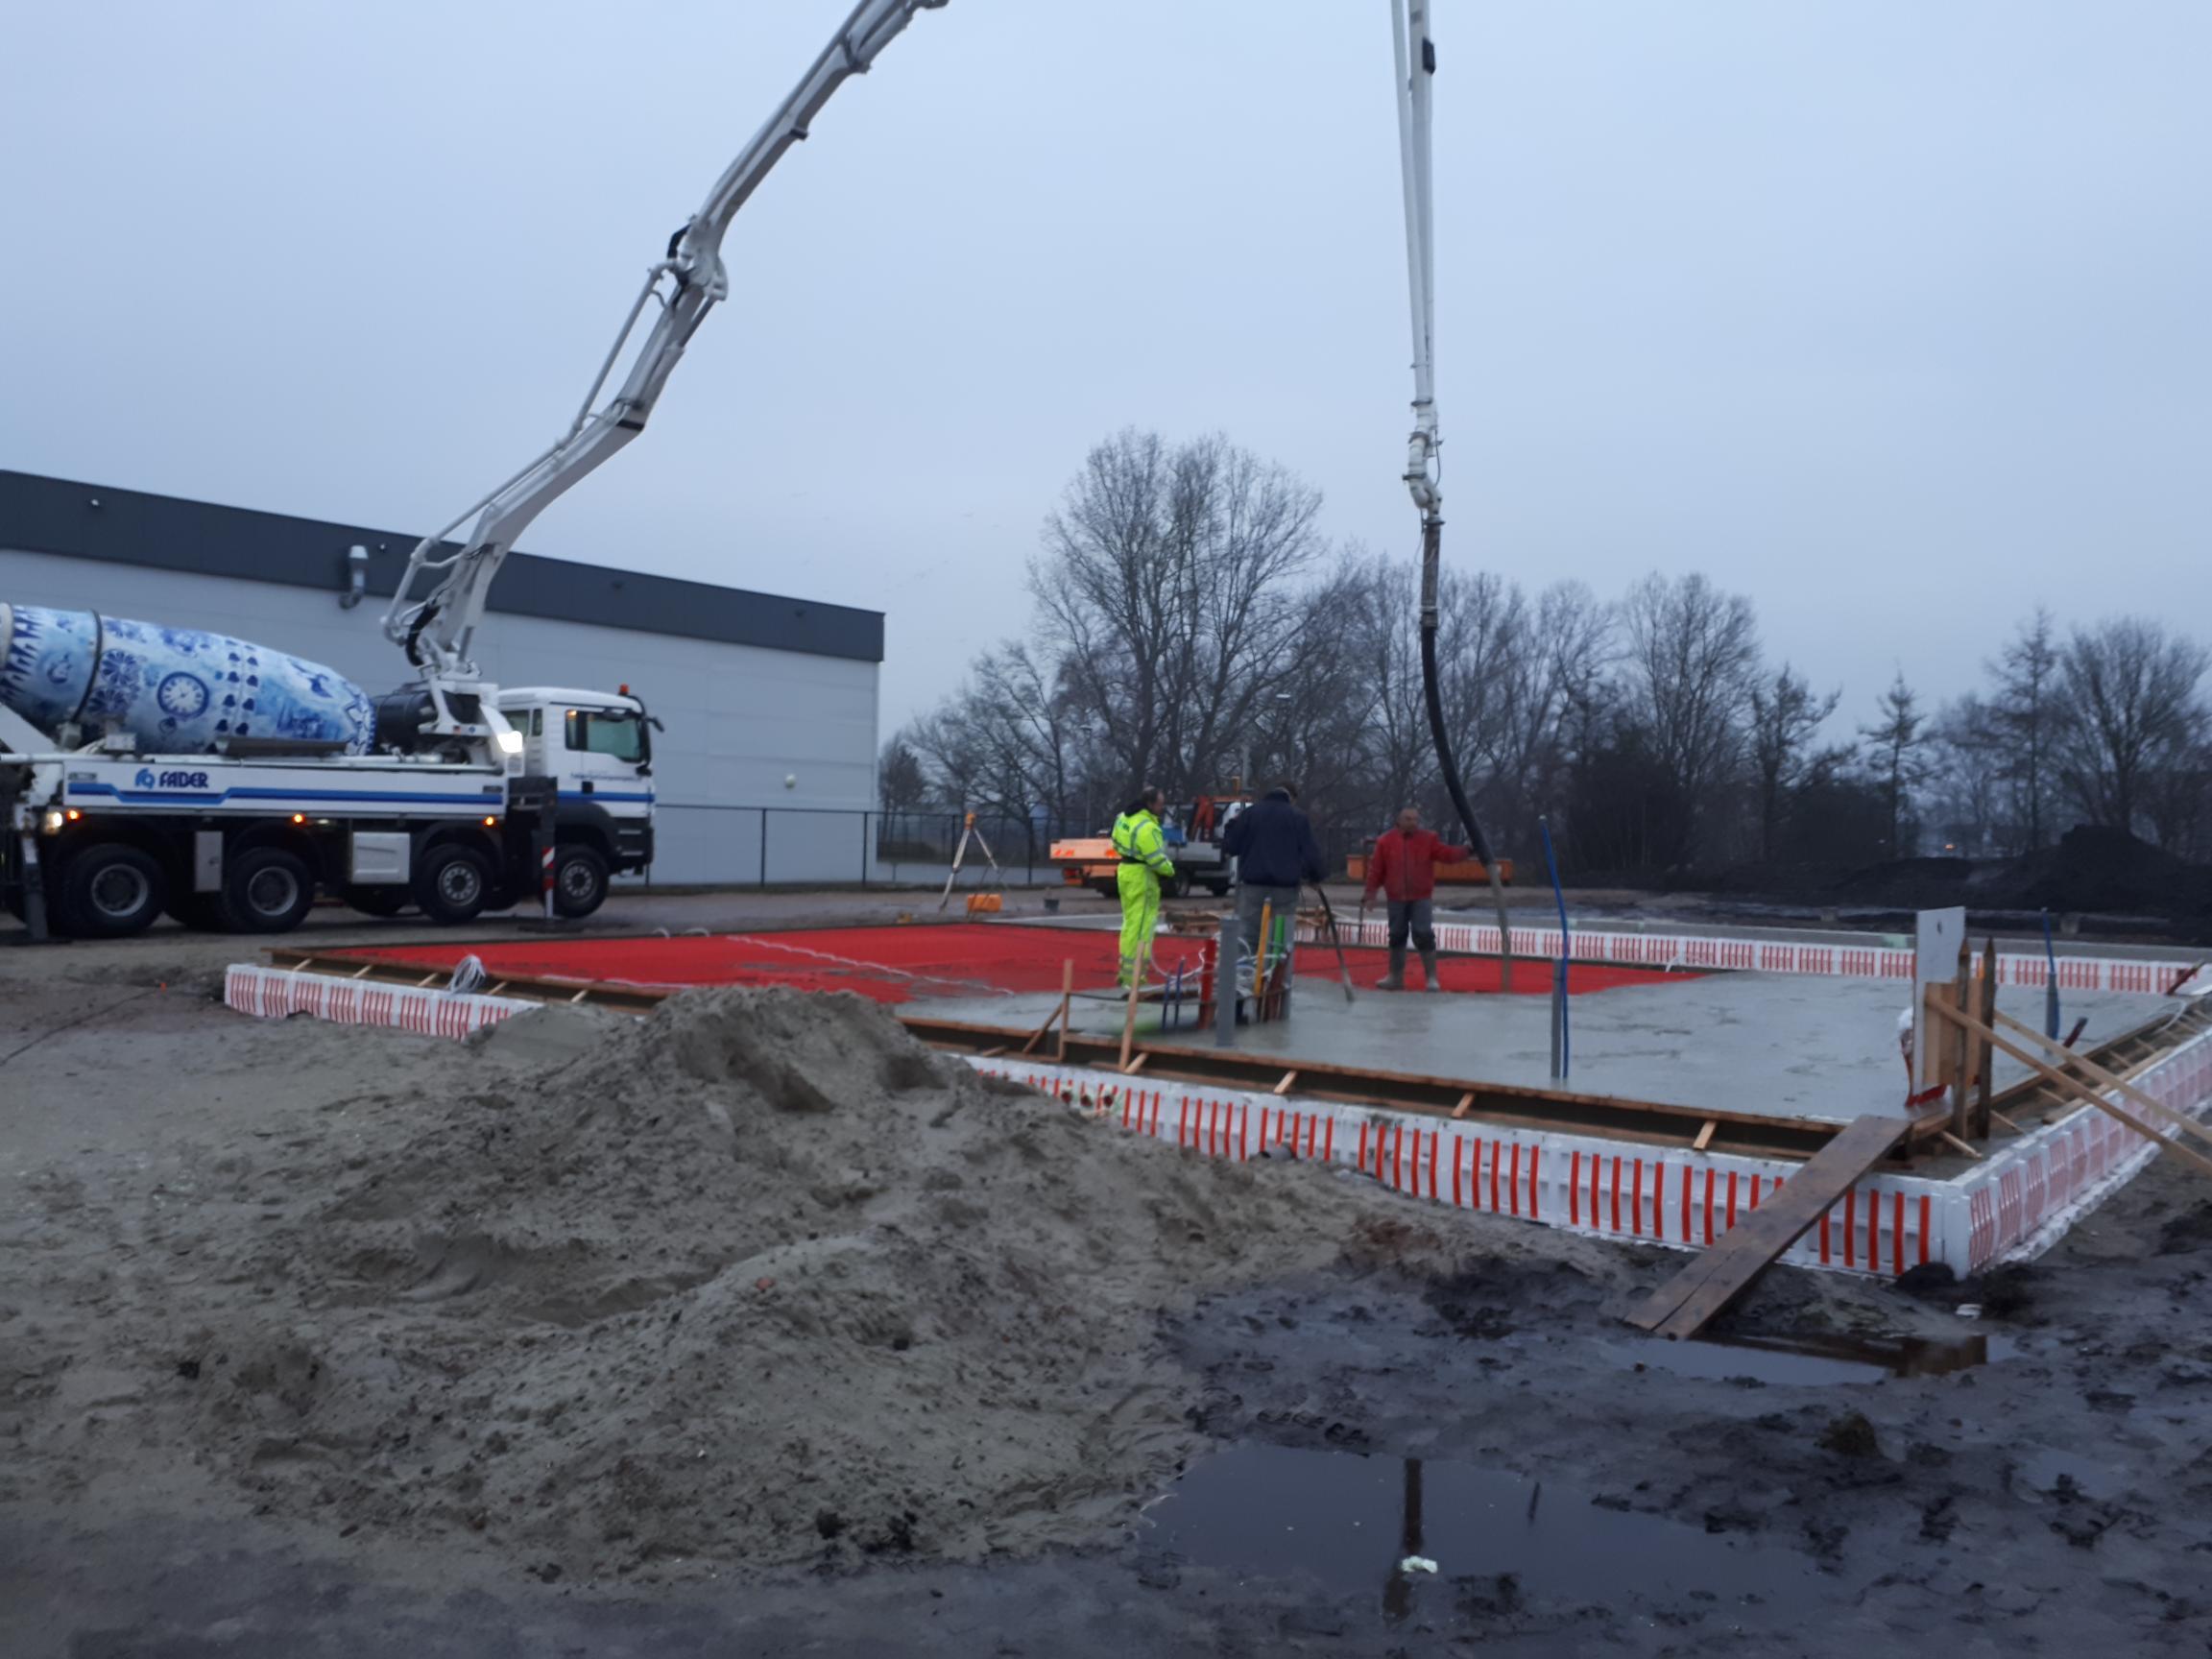 8ac032c7705 In Wolvega start nieuwbouw nieuw pand Delfsma Bouw & Ontwikkeling